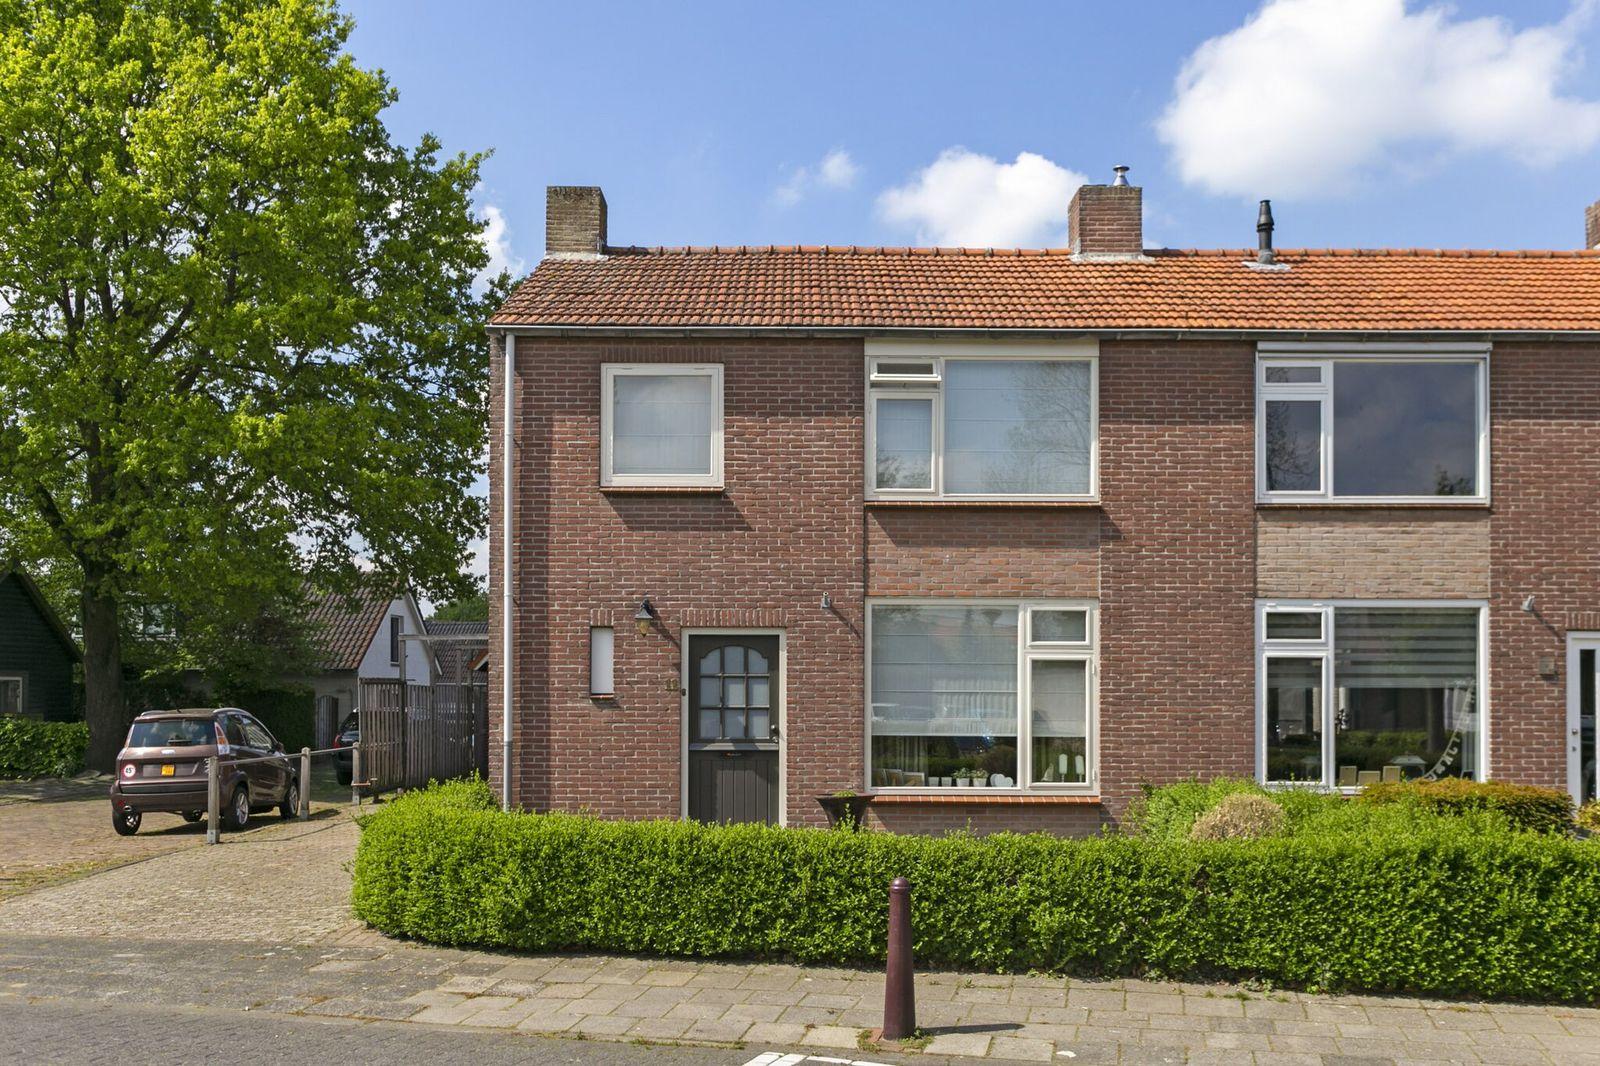 Sint Sebastiaanstraat 11, Hilvarenbeek